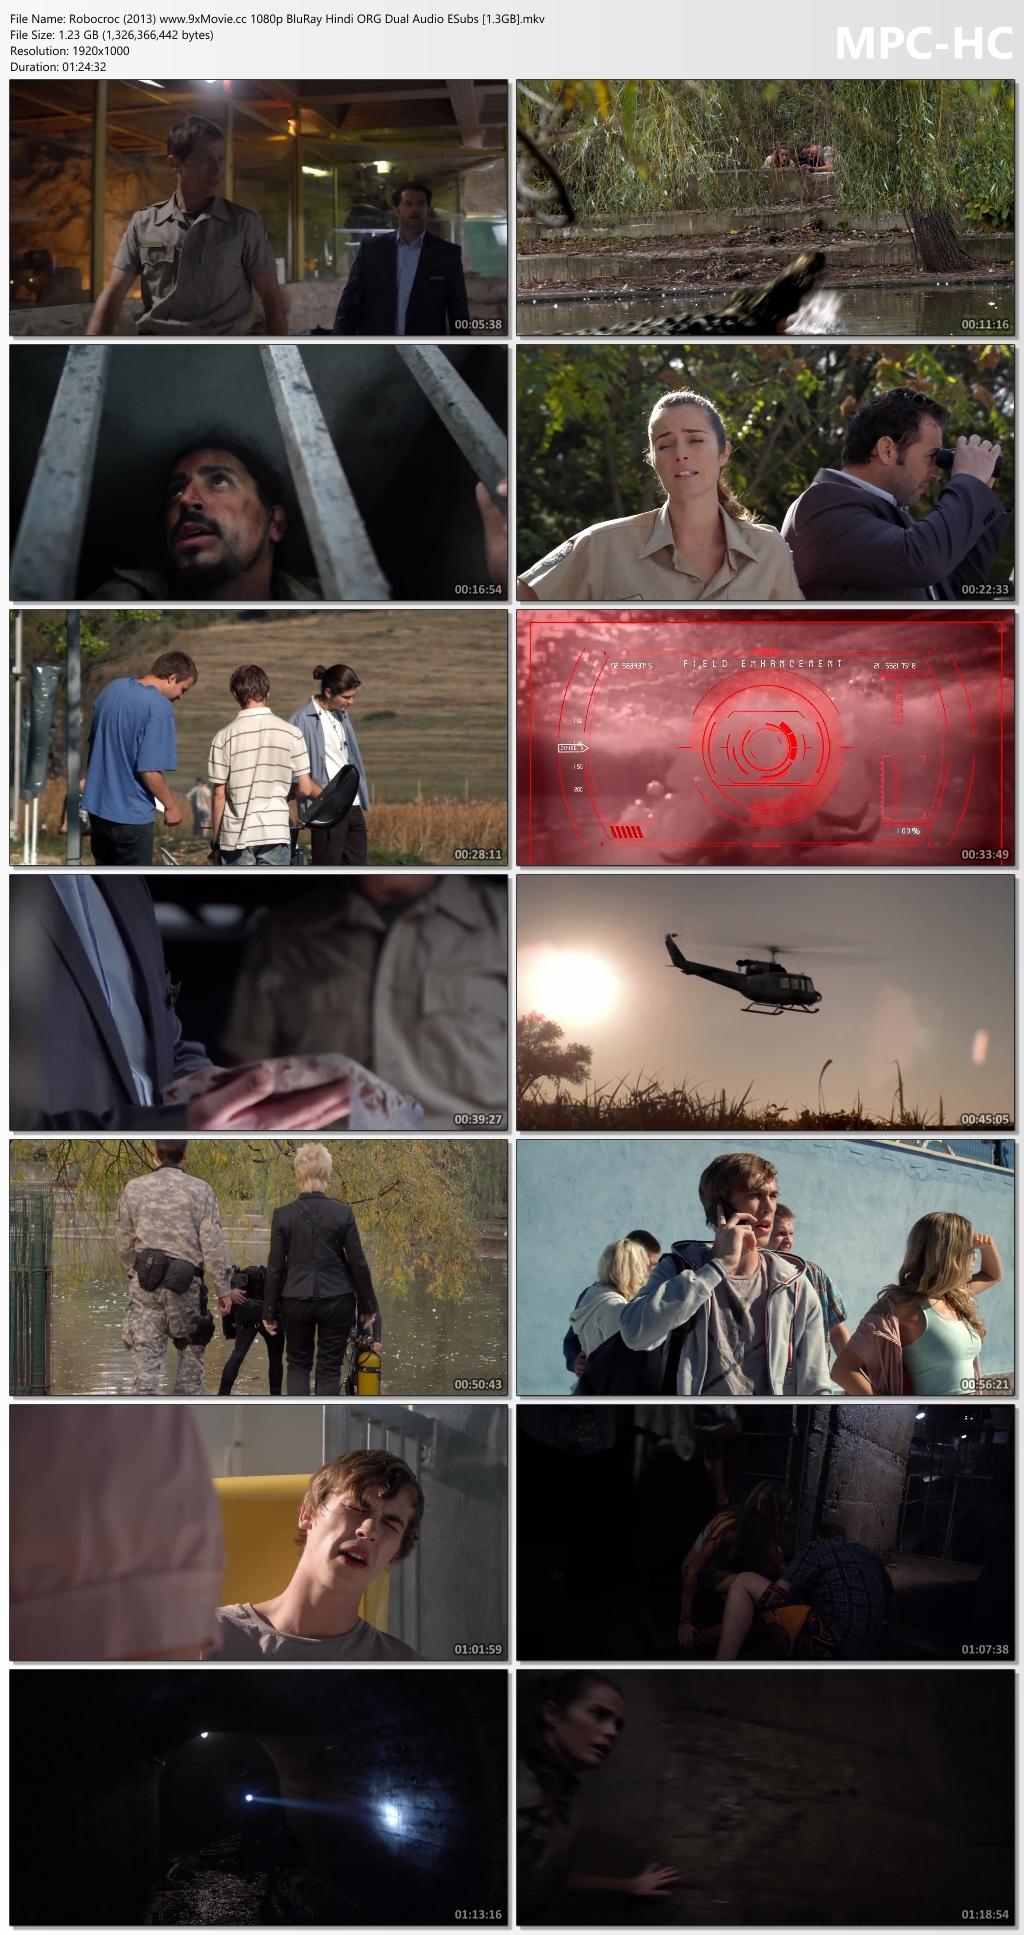 Robocroc-2013-www-9x-Movie-cc-1080p-Blu-Ray-Hindi-ORG-Dual-Audio-ESubs-1-3-GB-mkv